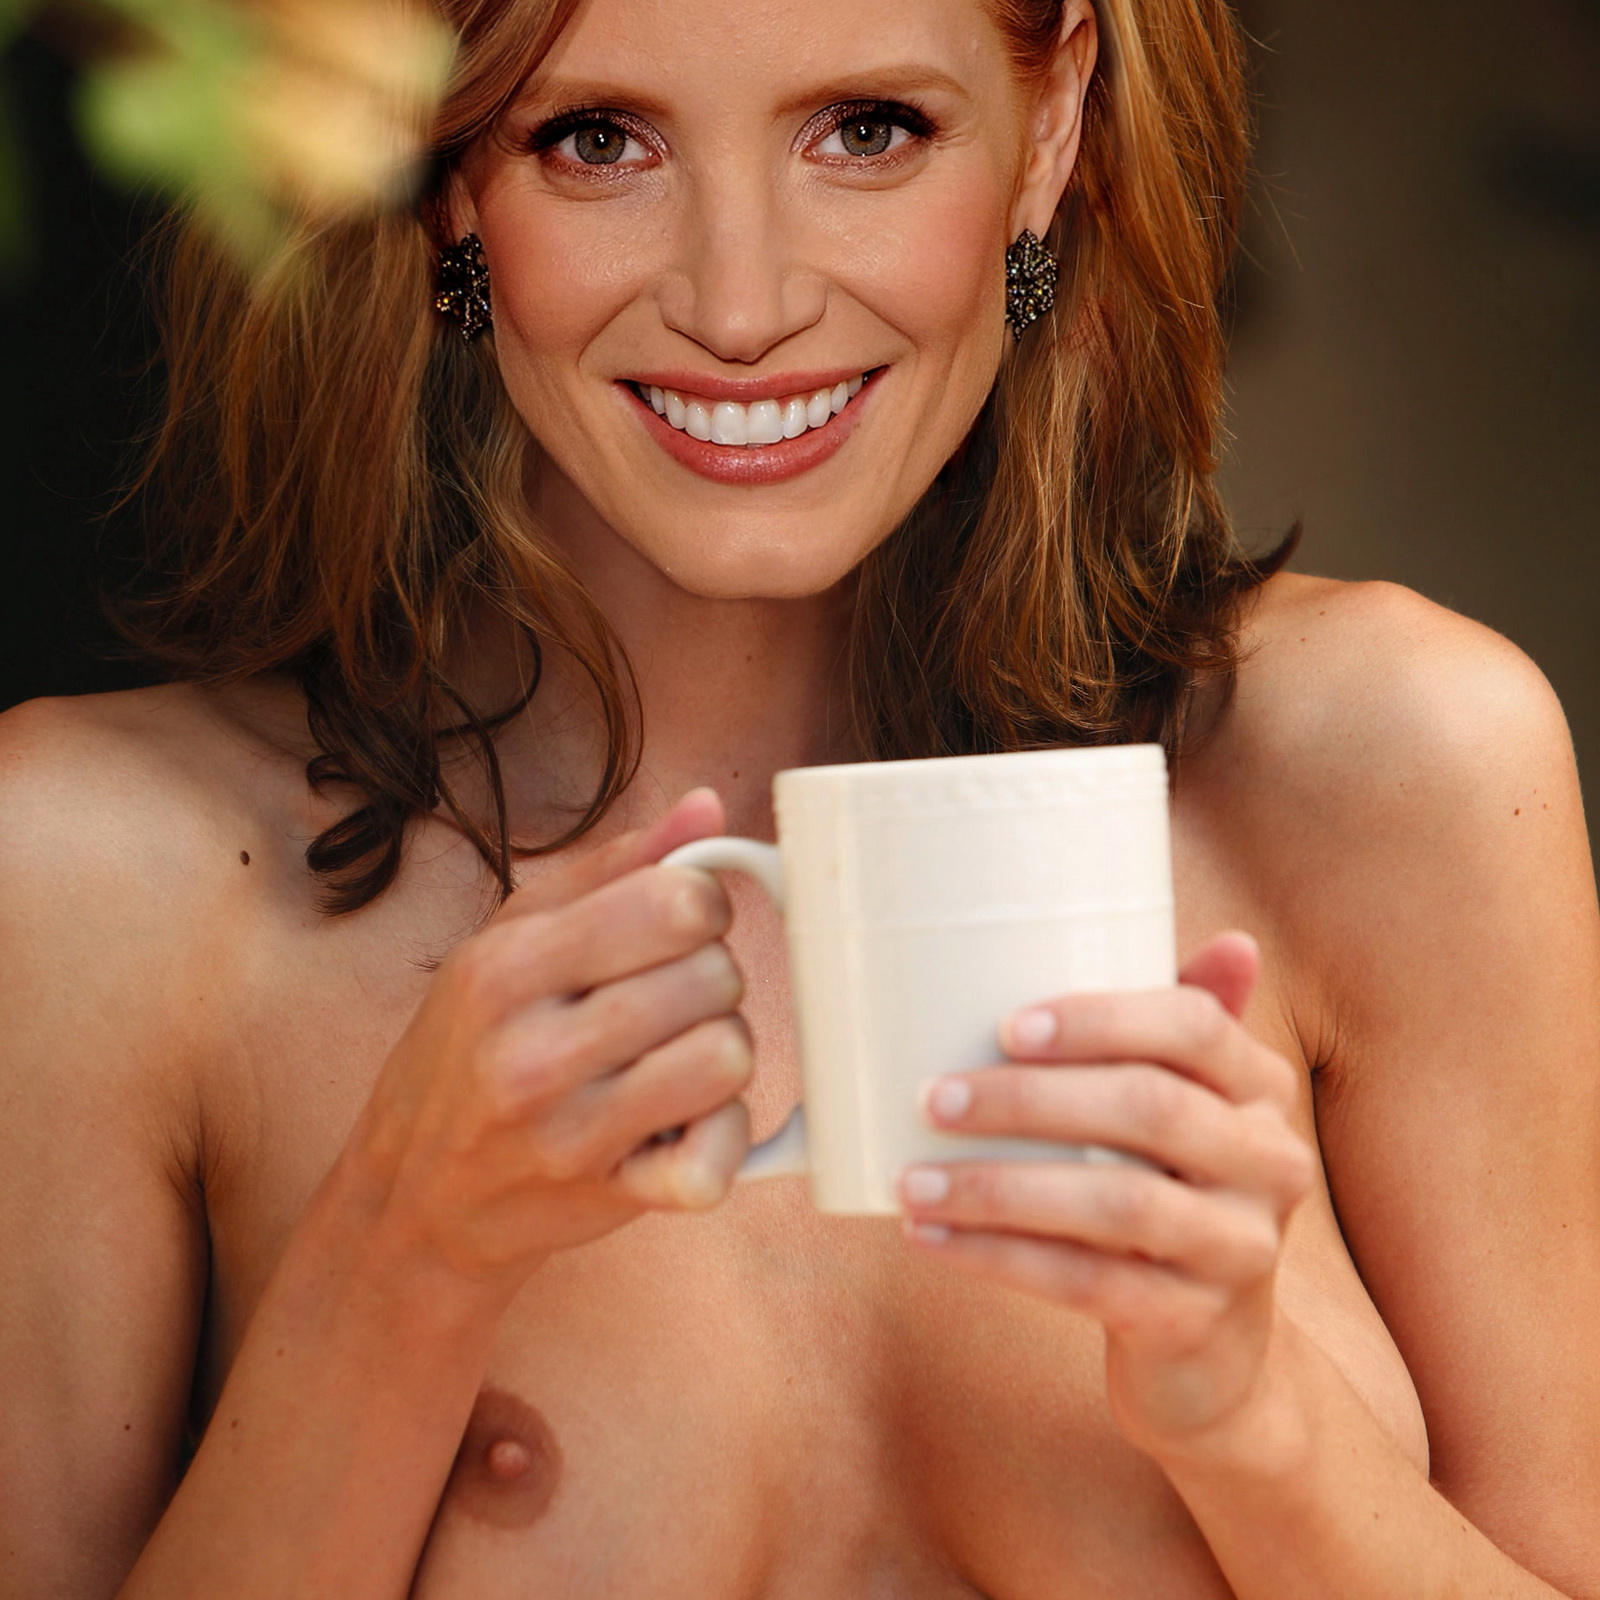 http://1.bp.blogspot.com/-ggAxYgmCo78/Tya1WjL934I/AAAAAAAADyI/9GzI3pPFTvI/s1600/Jessica_Chastain_topless_in_the_park.jpg